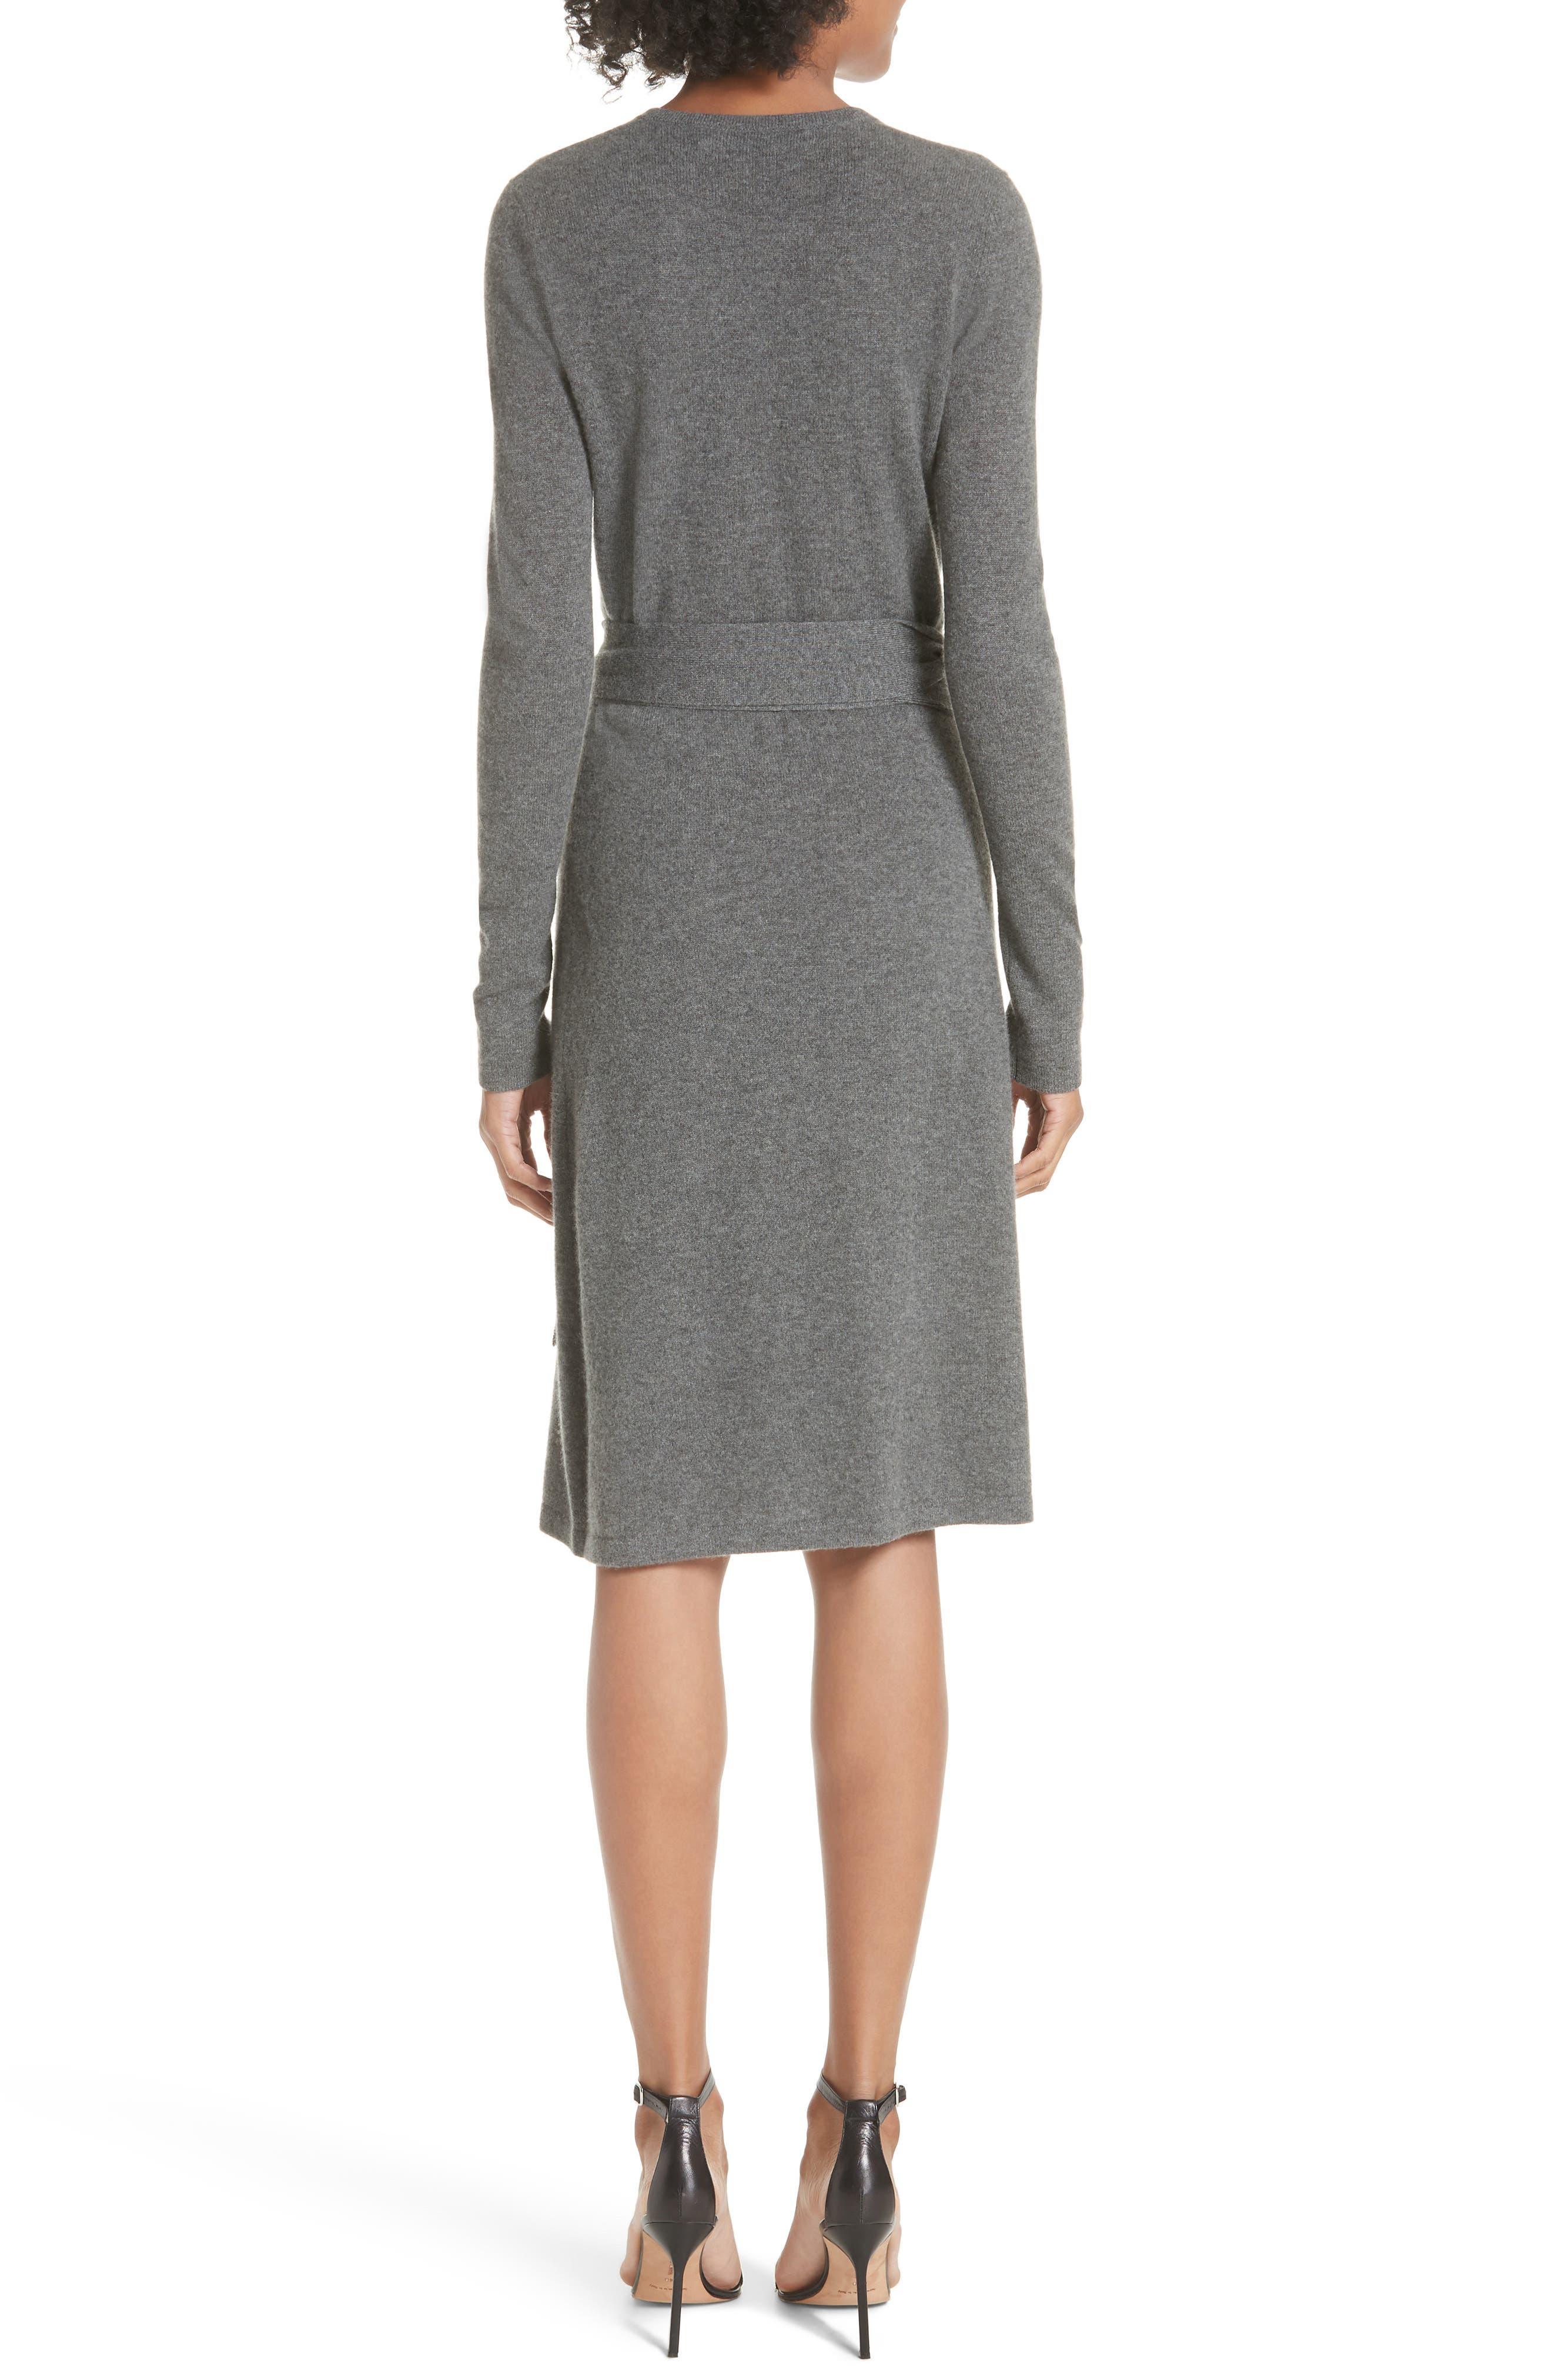 Diane Von Furstenberg Linda Cashmere Wrap Dress,                             Alternate thumbnail 2, color,                             Charcoal Melange